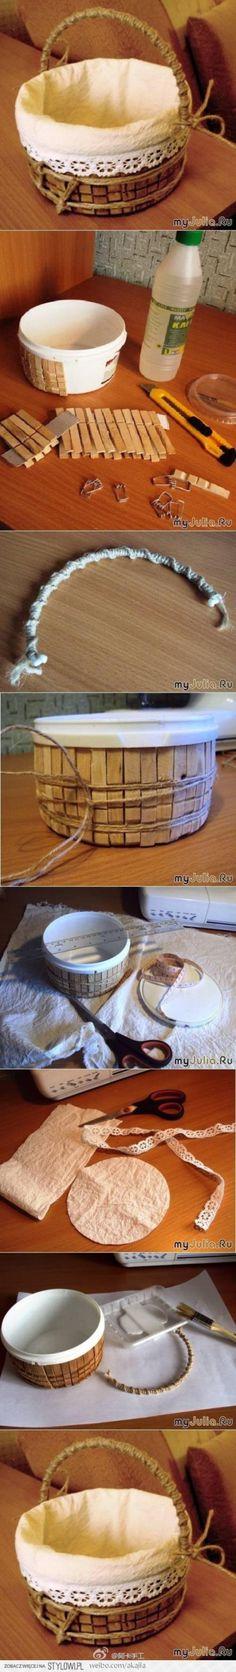 【DIY篮子】Ĝ……_来自锦瑟故梦的图片分享-堆糖